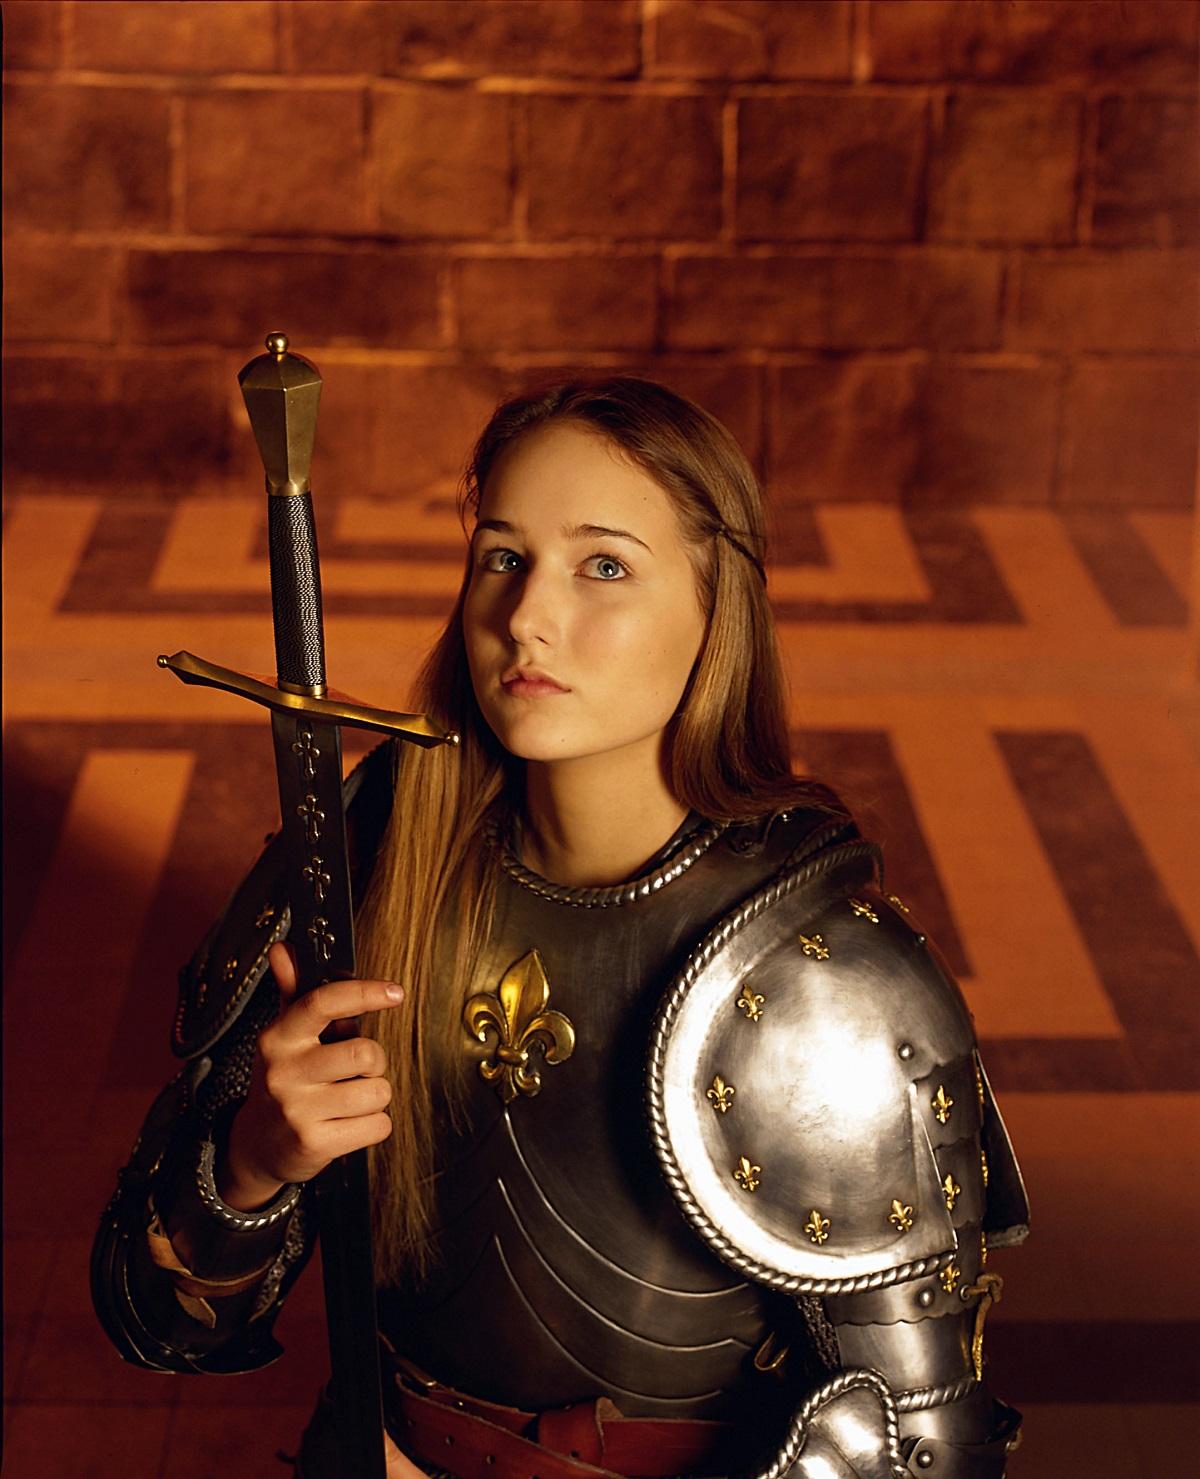 Leelee Sobieski in 'Joan of Arc' in 1999